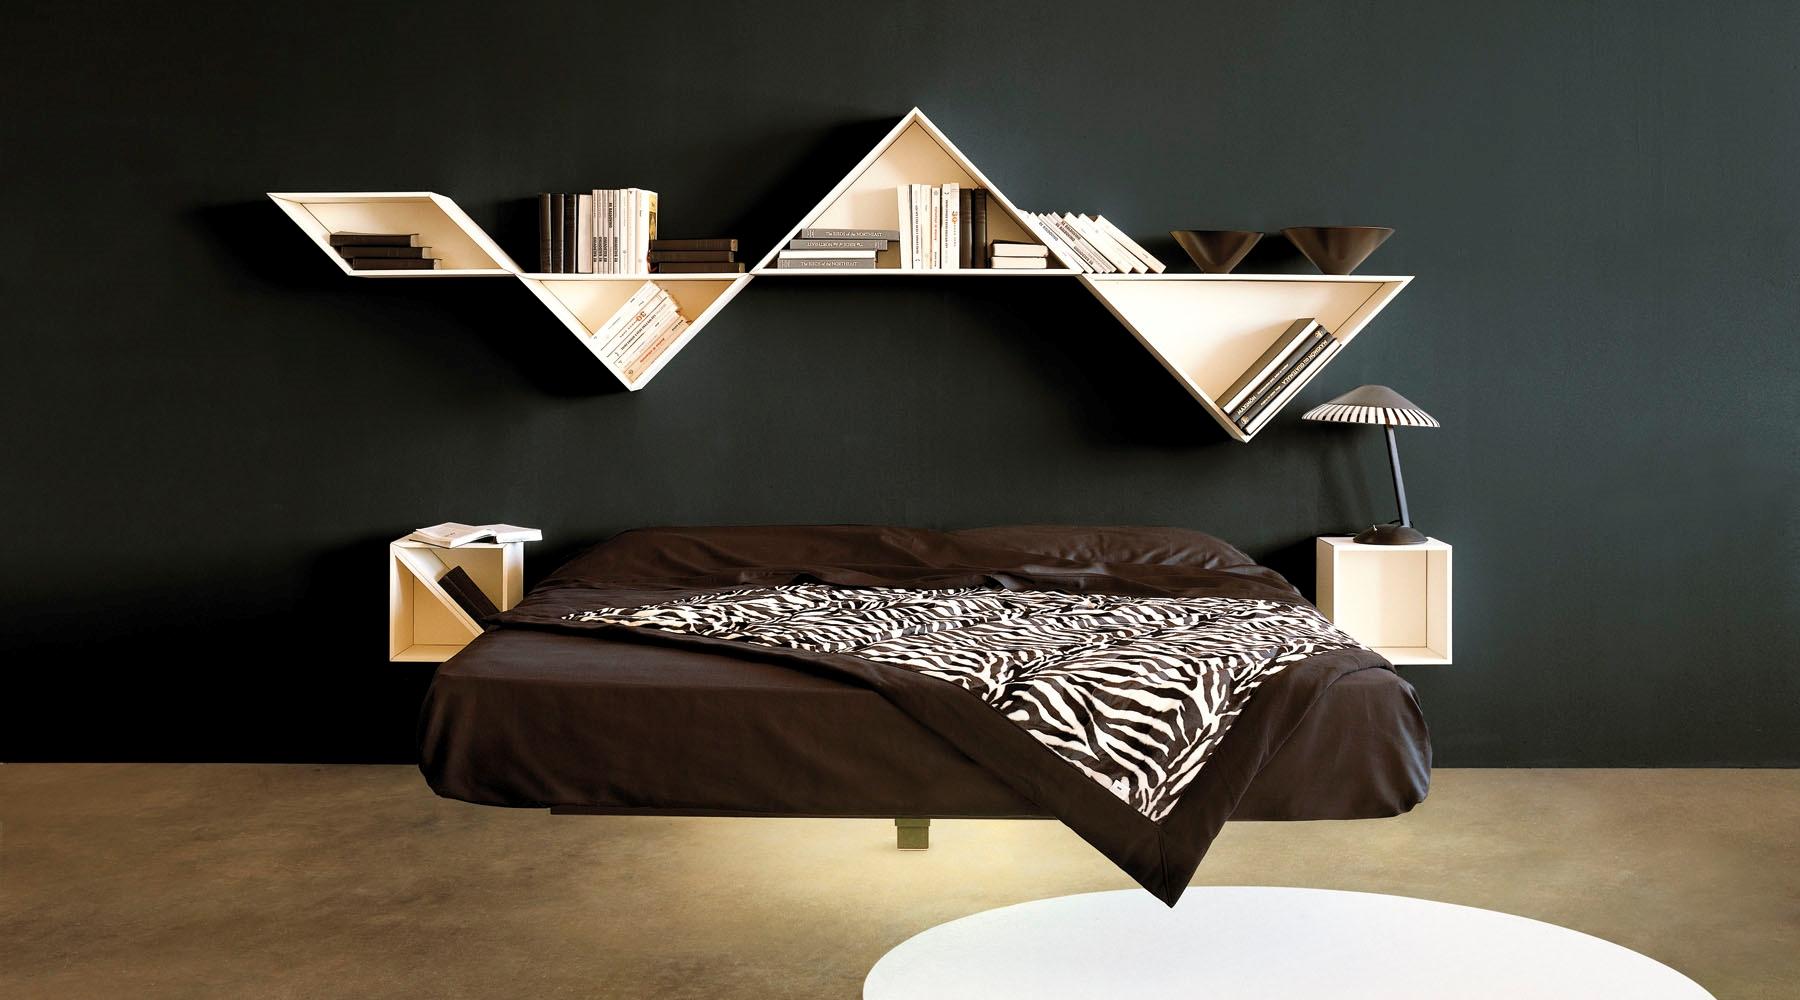 Lago complemento tangram design laccato opaco - Librerie da camera ...